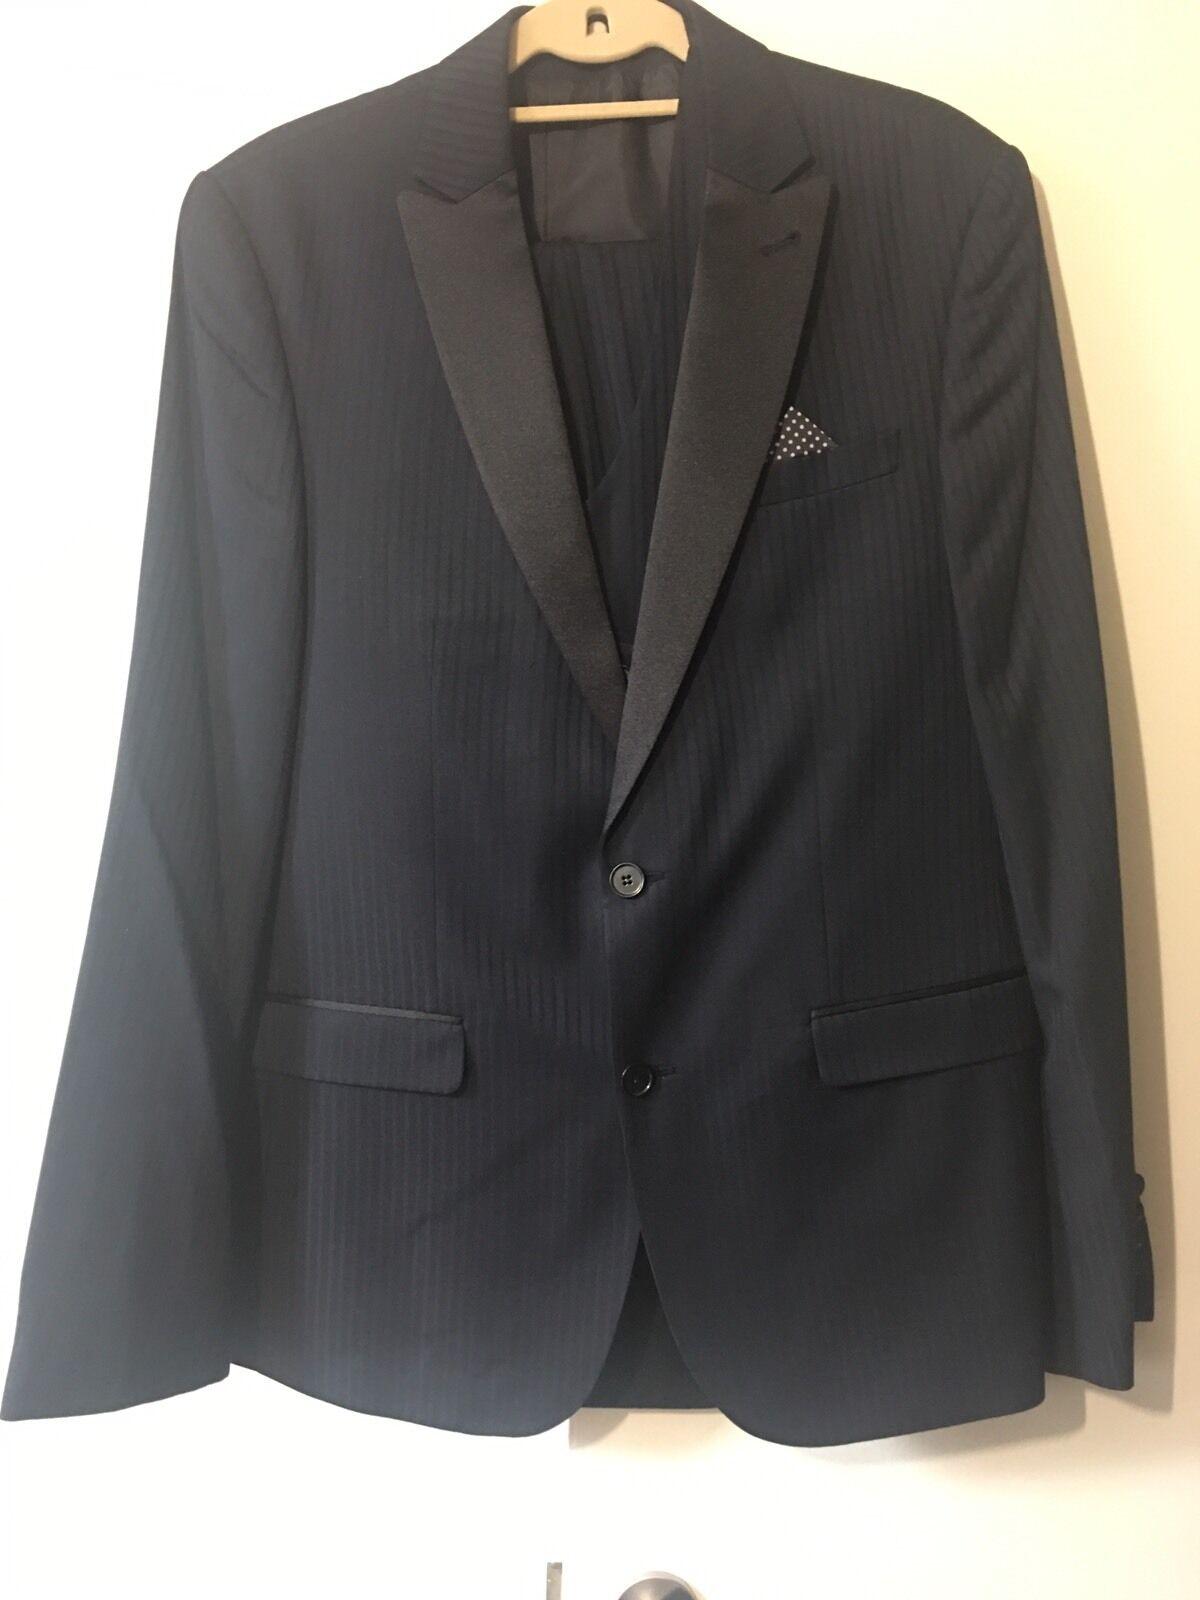 Mens Asos 3 Piece Suit New 42 Blazer & Waistcoat 34 Trousers Navy Pin Stripe